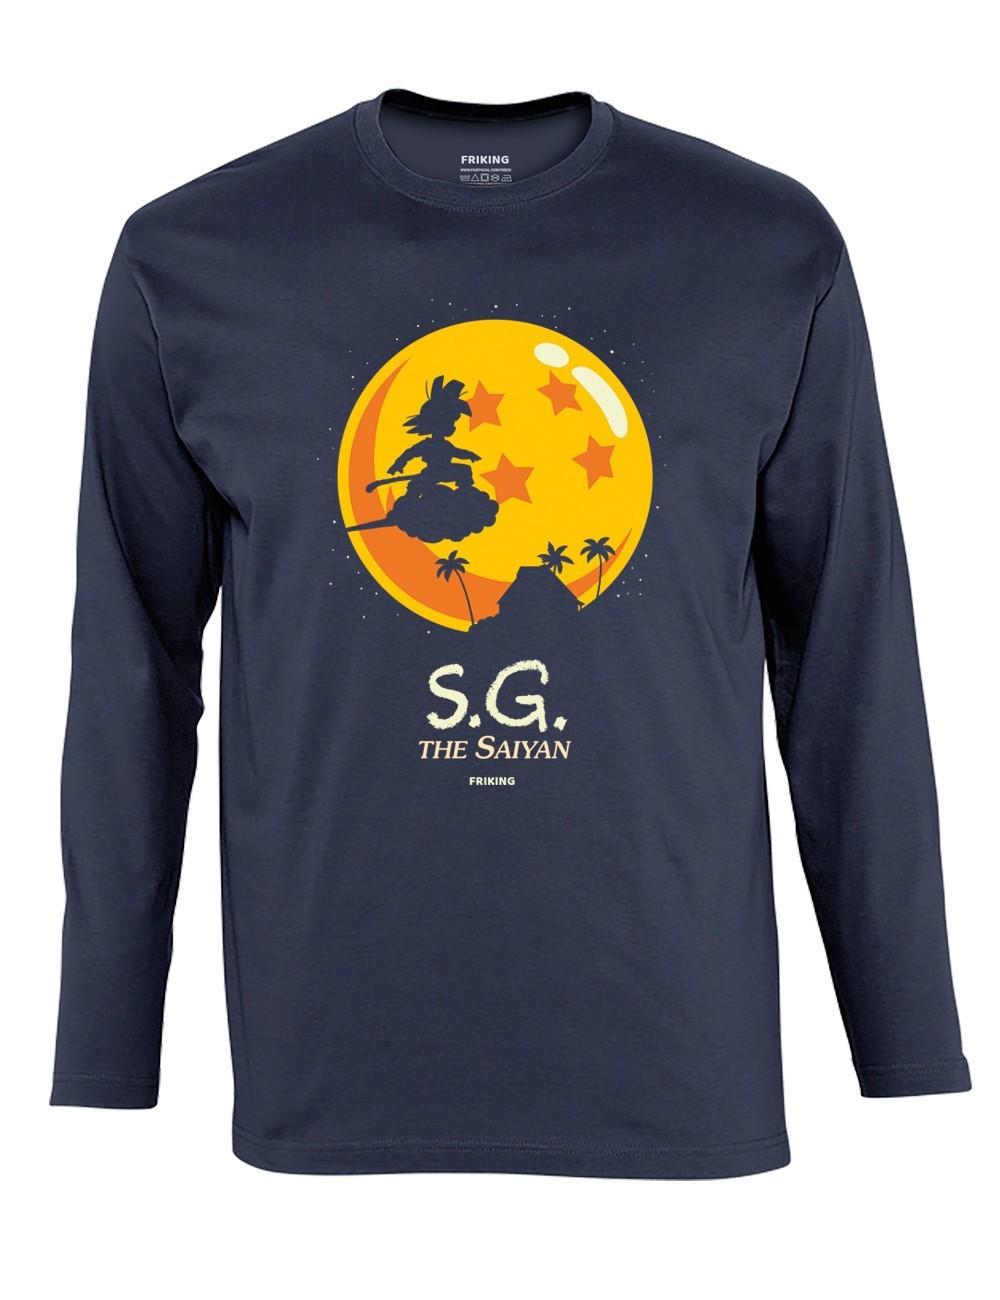 S.G. the saiyan